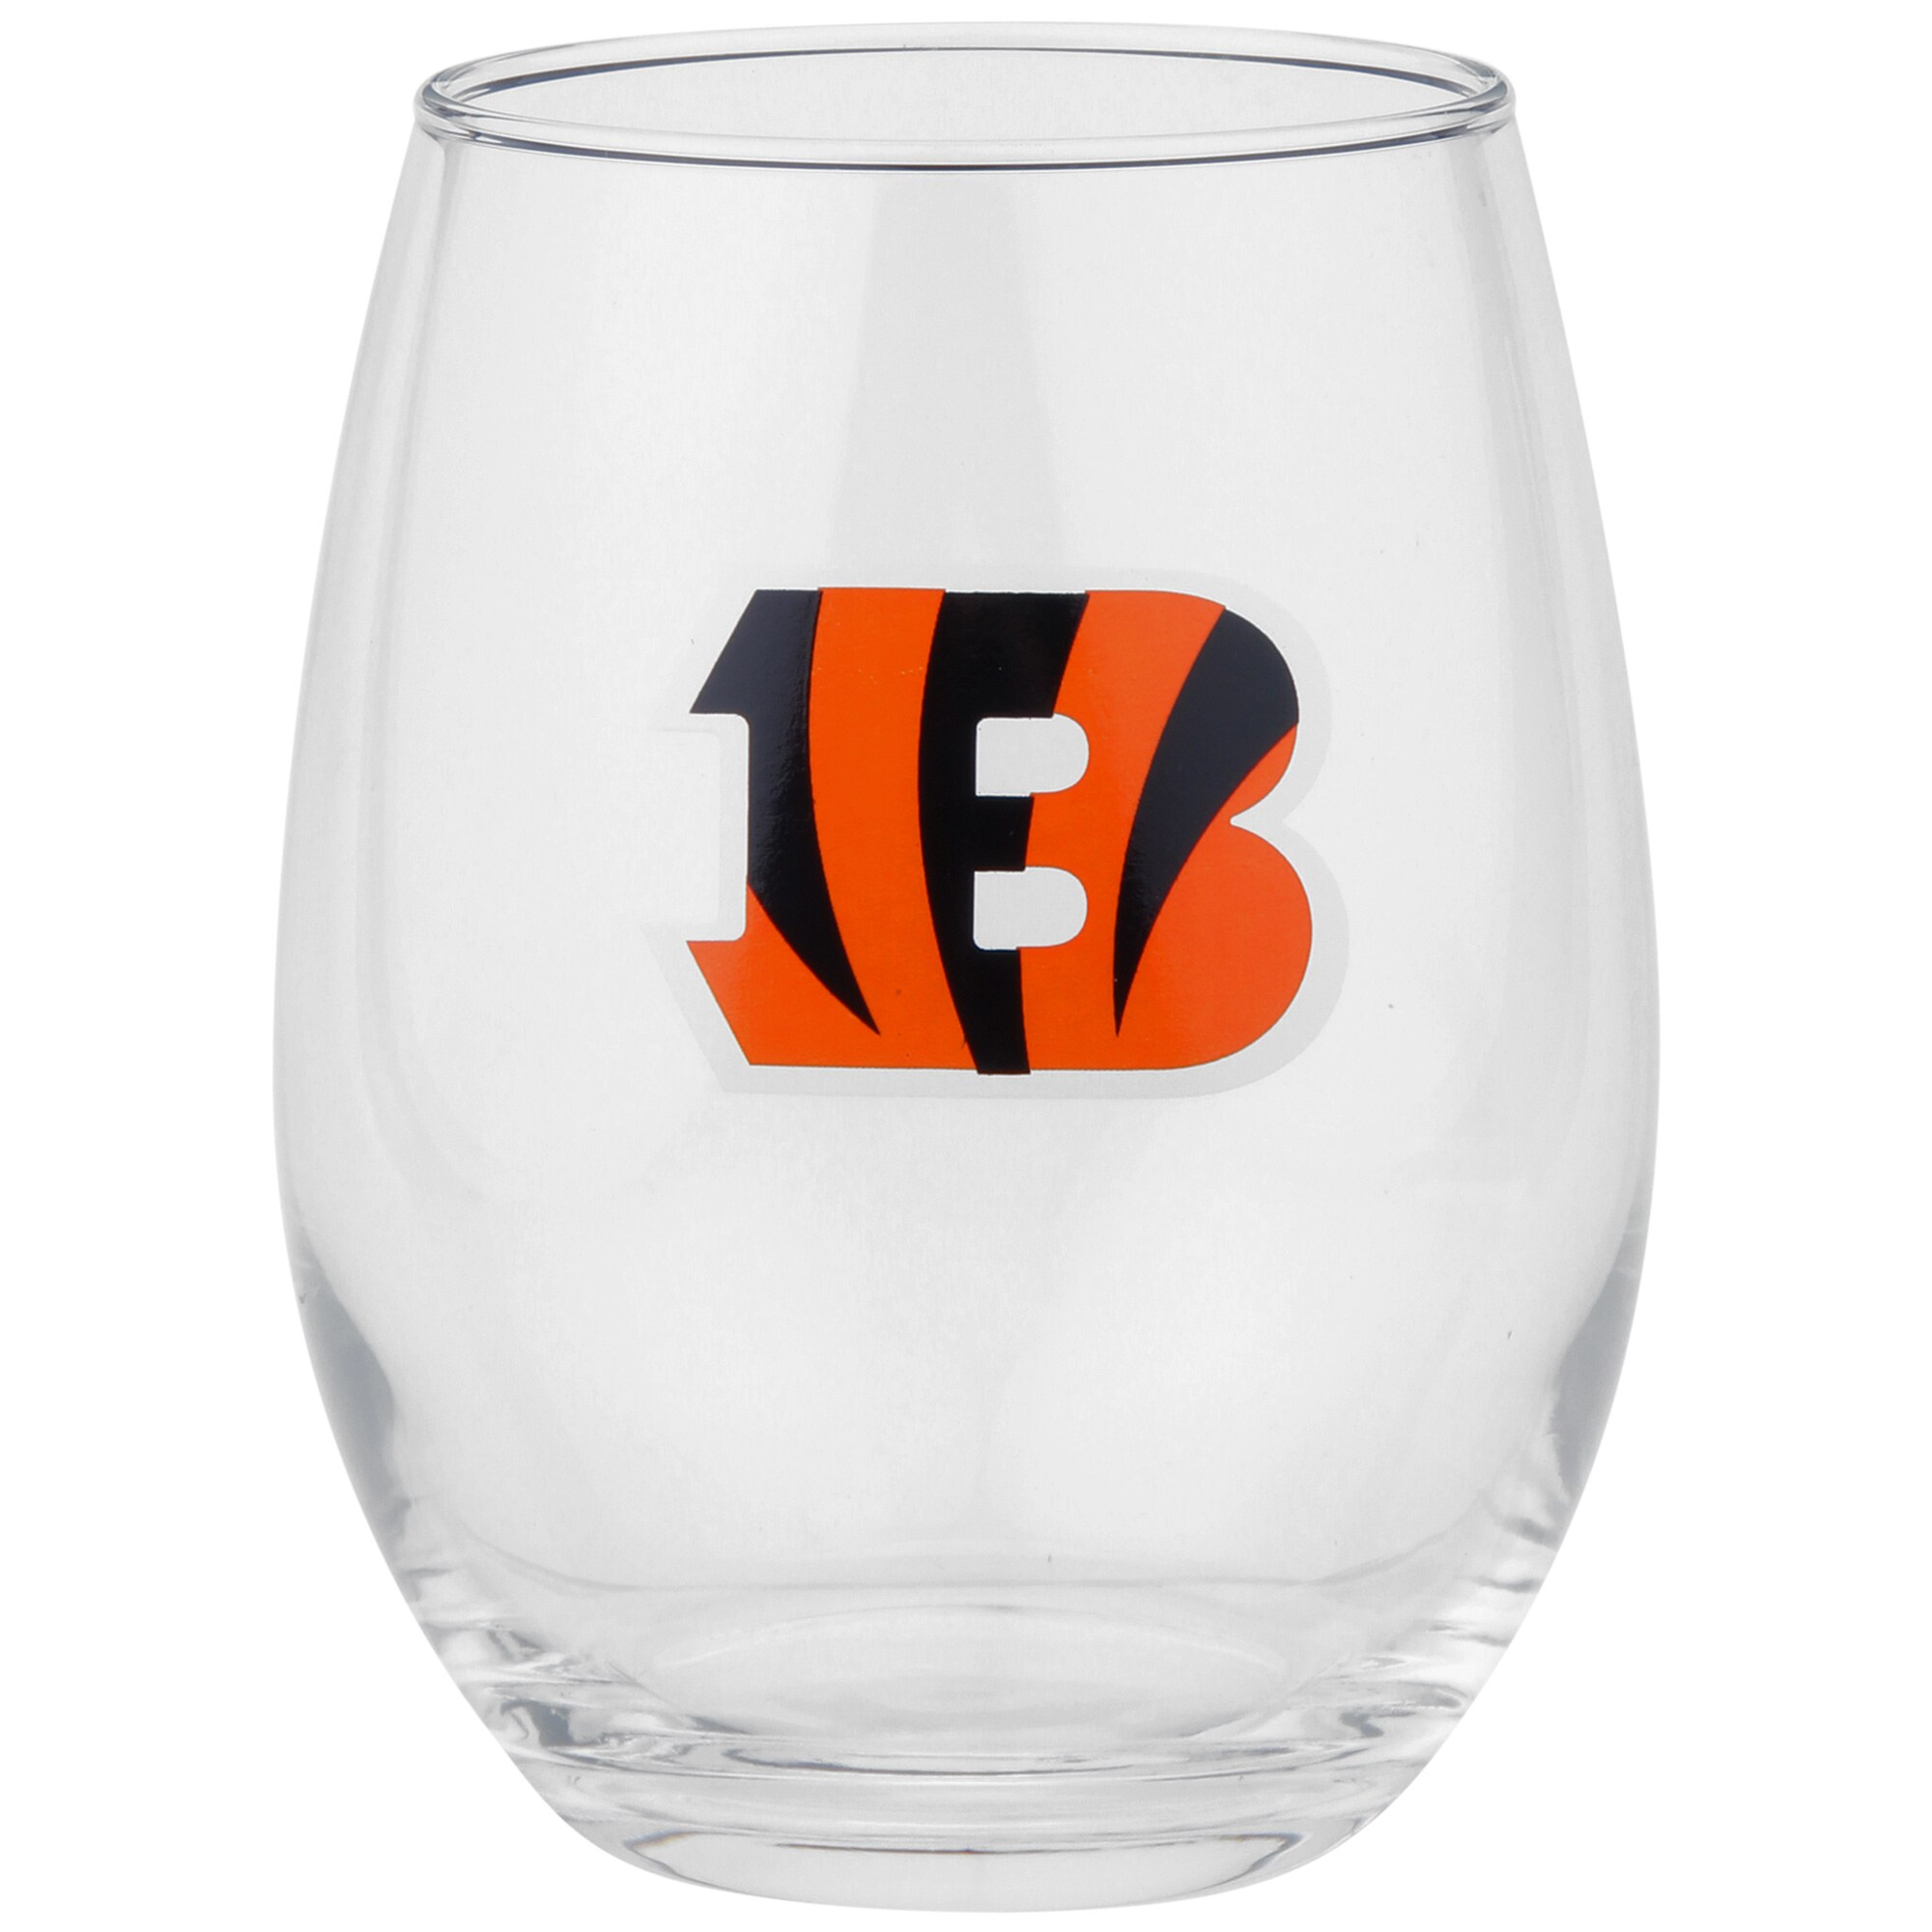 Cincinnati Bengals 15oz. Stemless Wine Glass